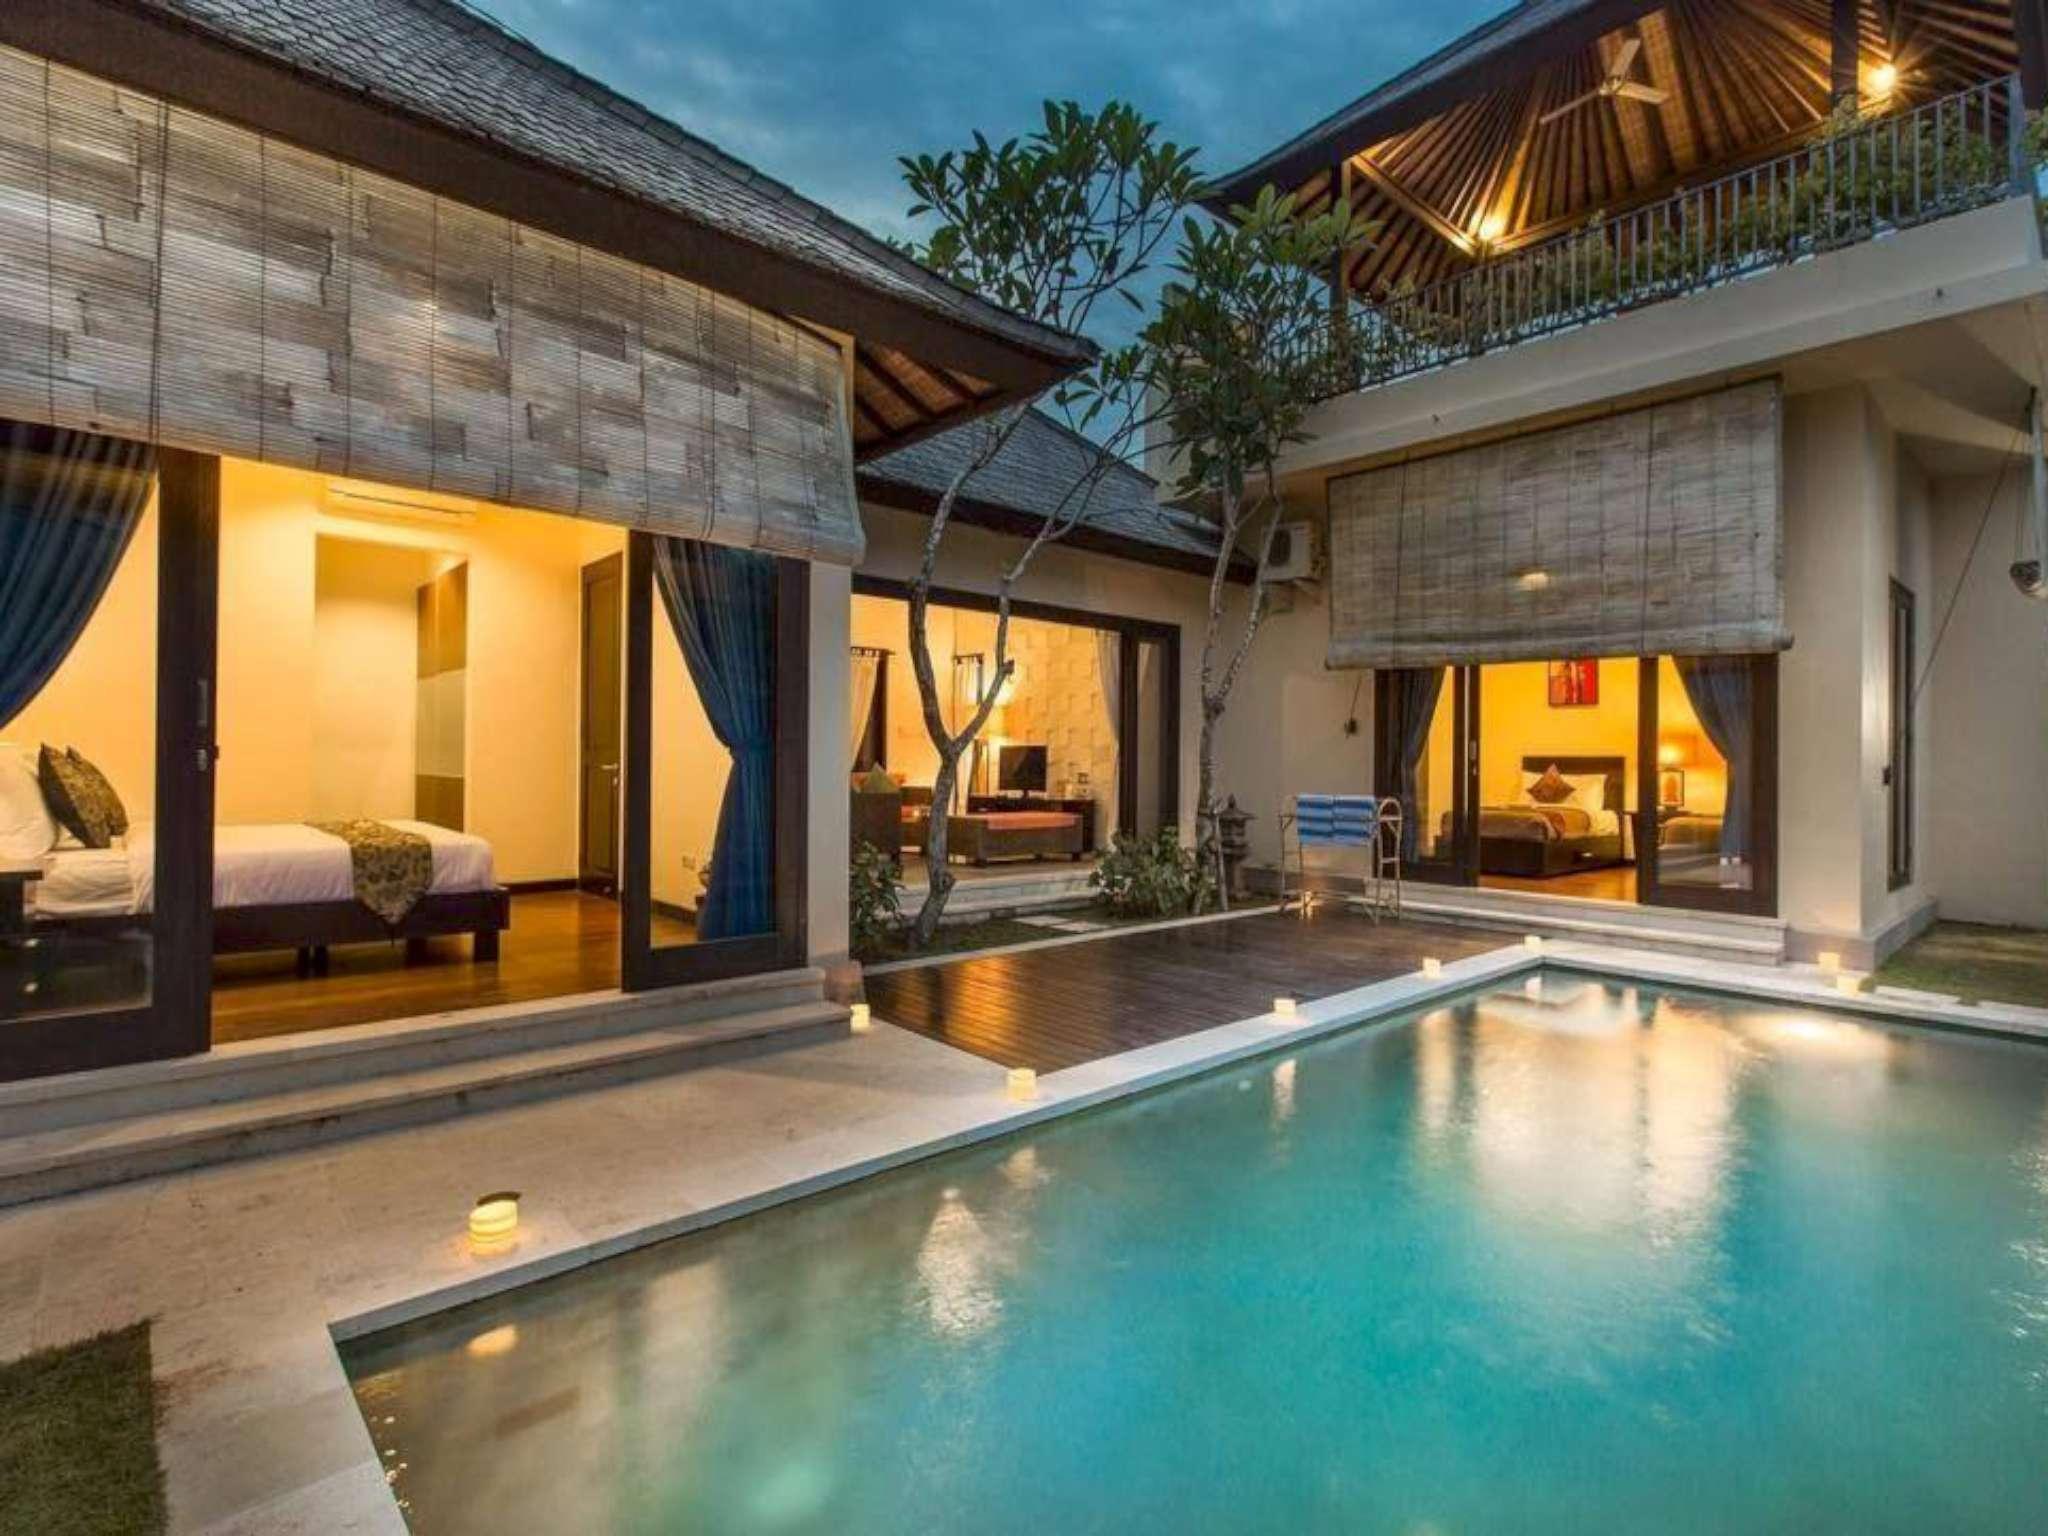 2 Bedroom Villas 9 Km From Uluwatu Temple